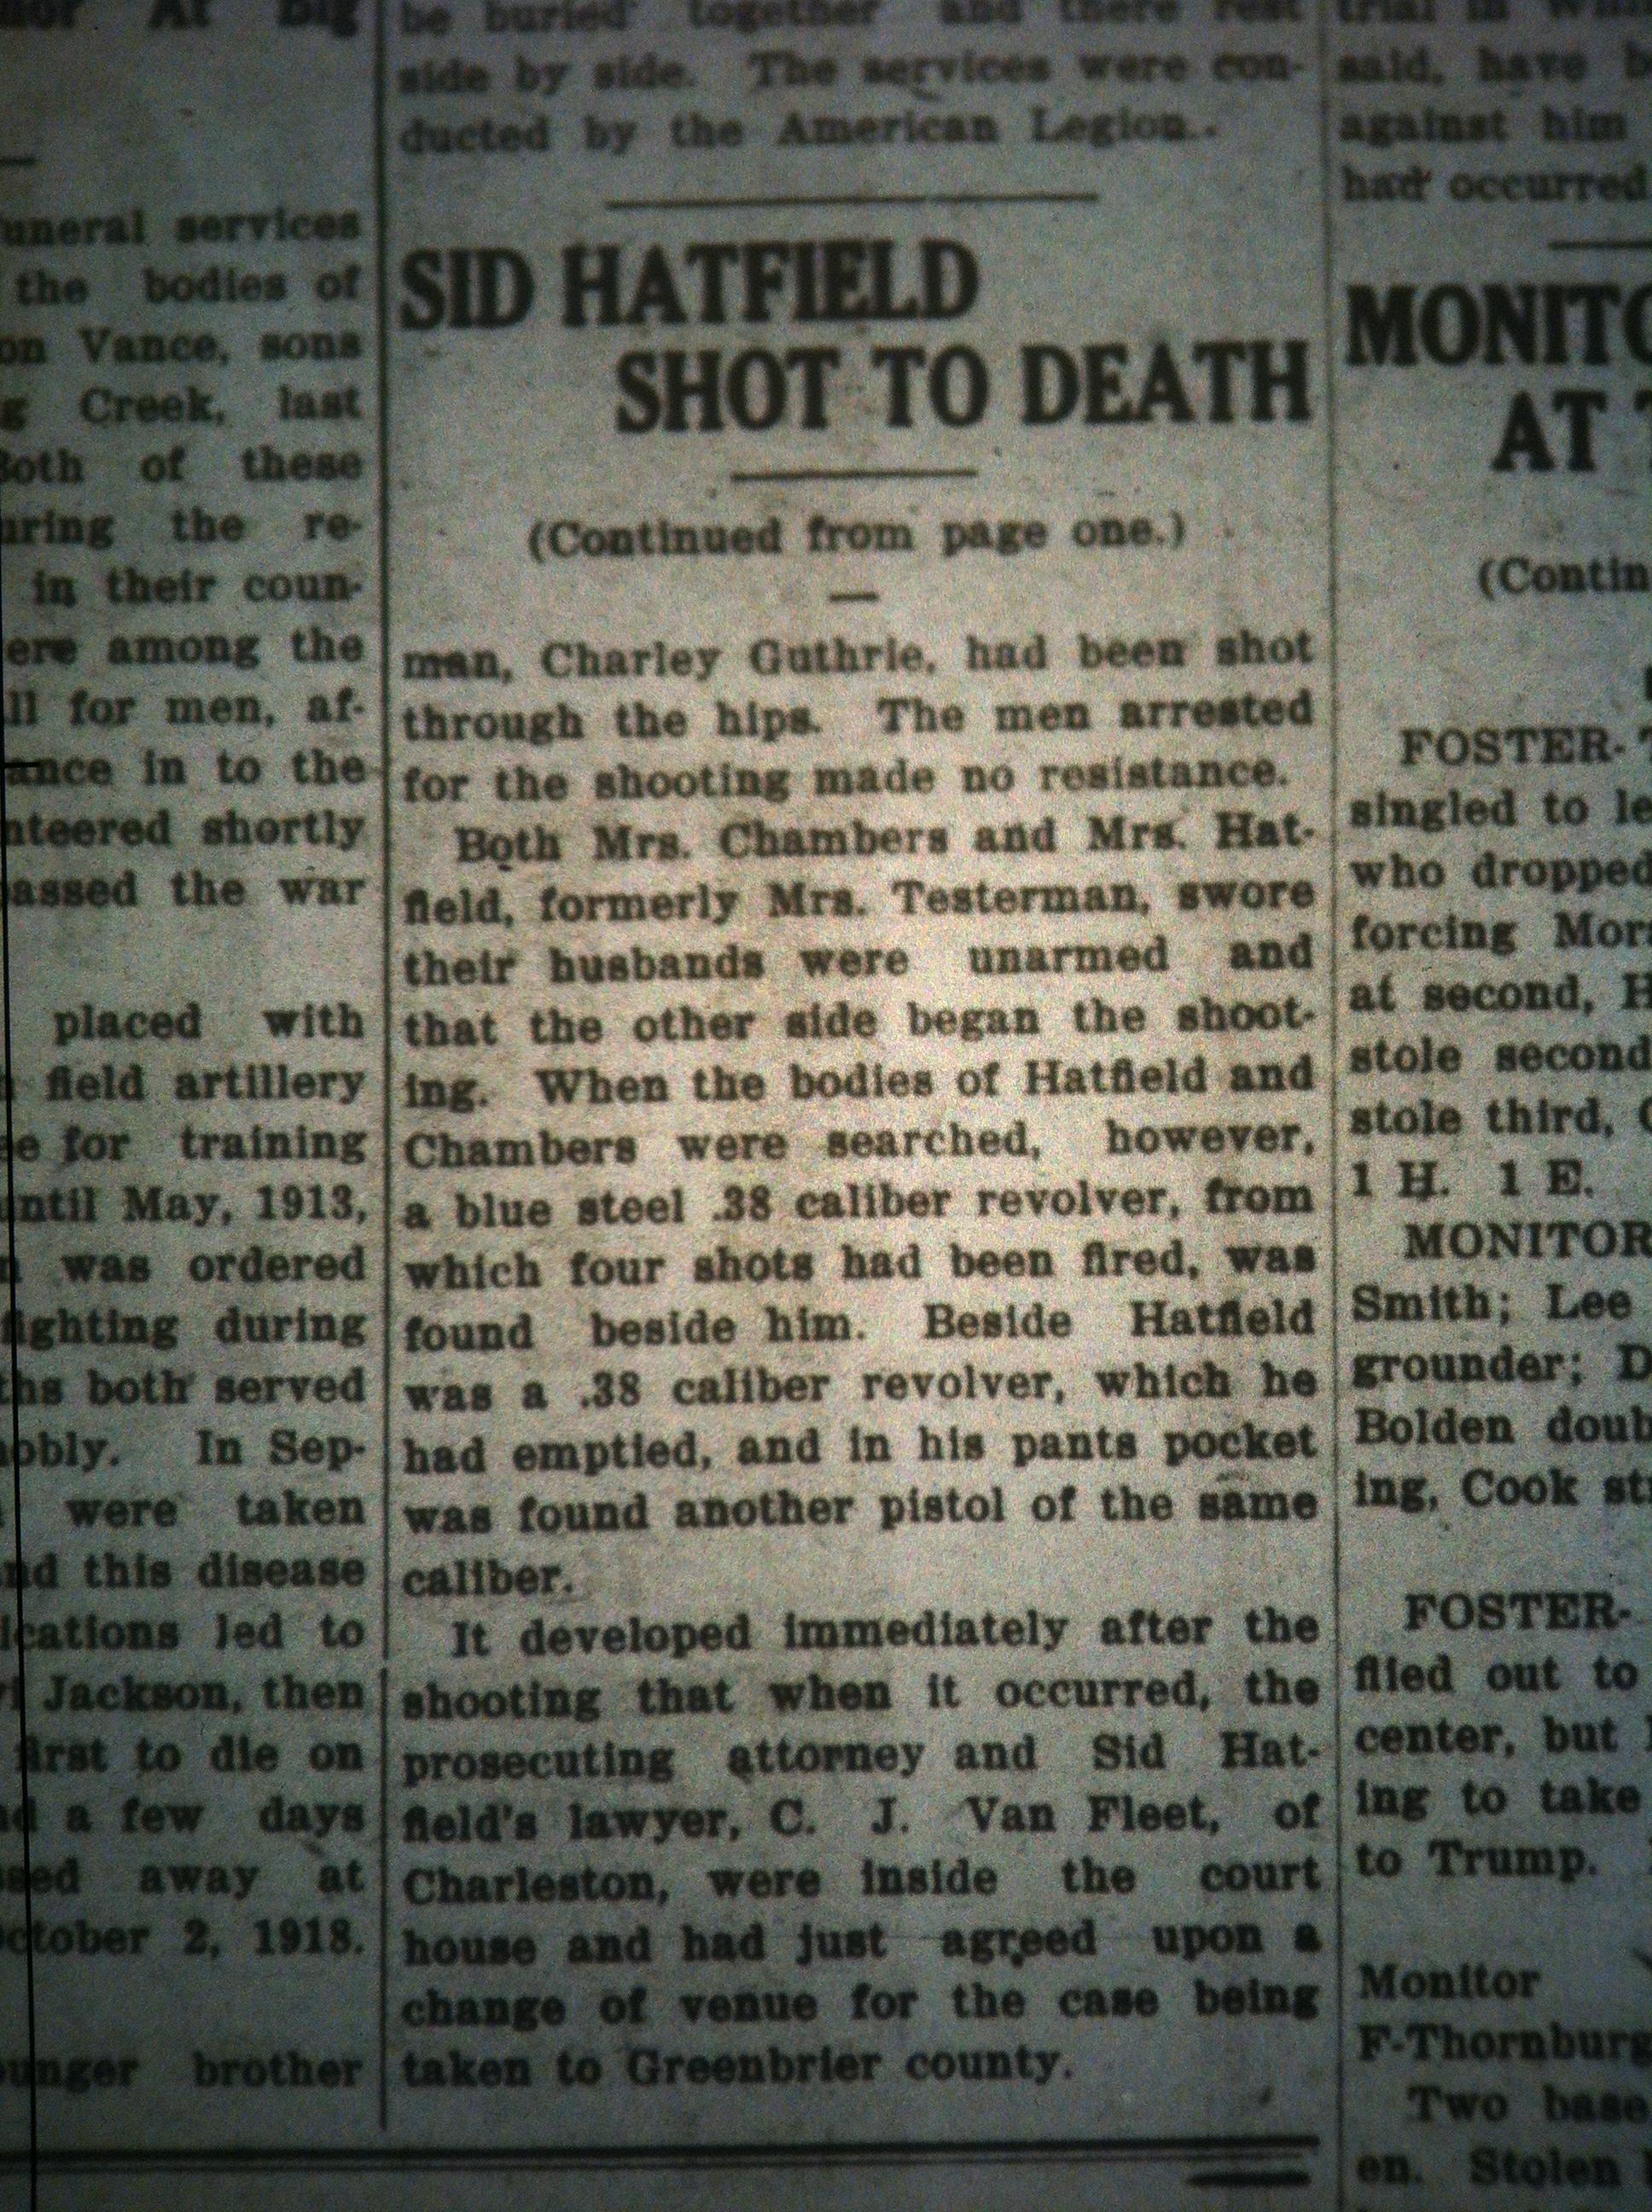 Sid Hatfield Shot to Death LB 08.05.1921 5